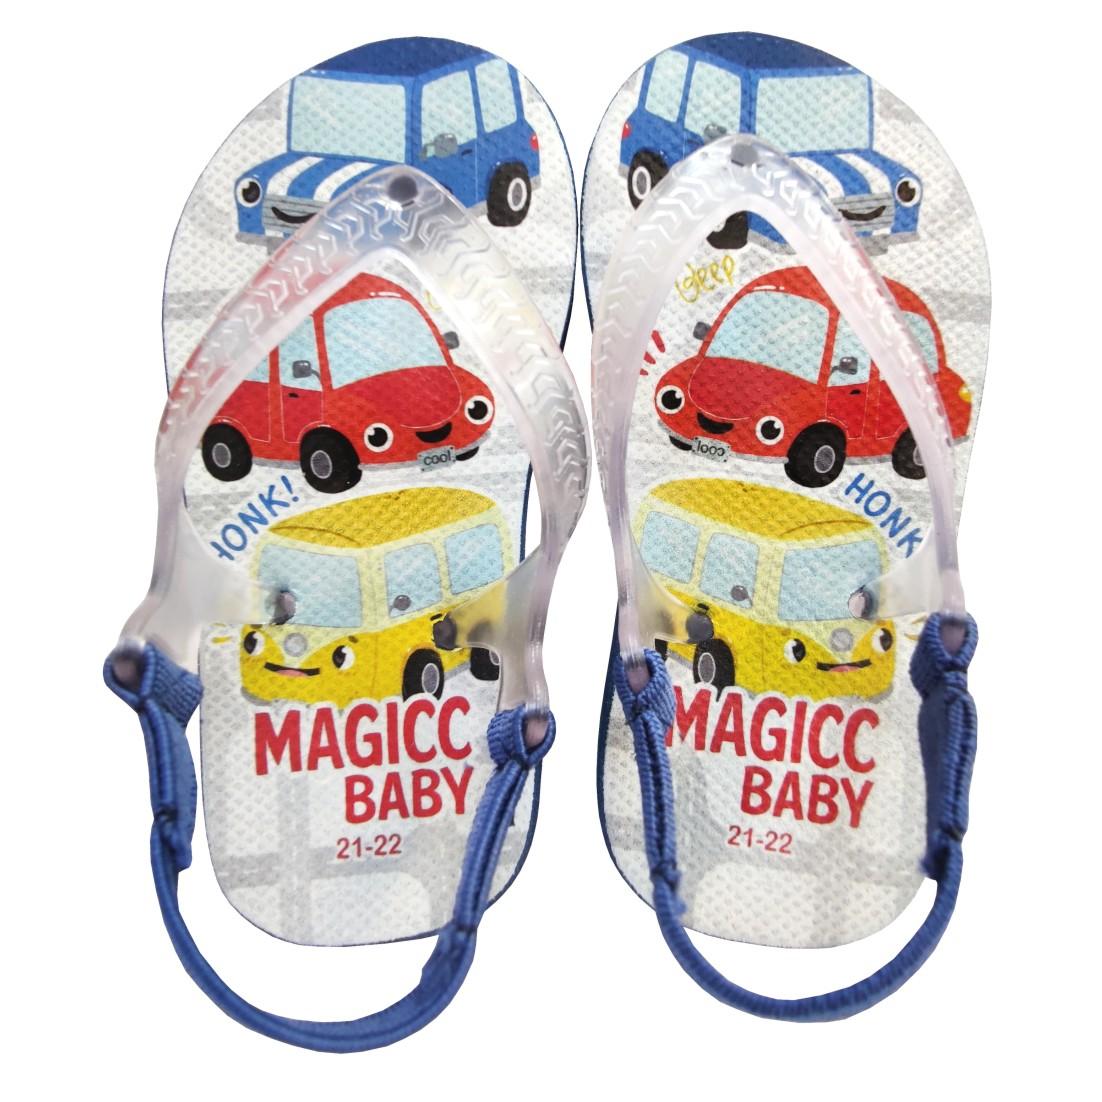 Chinelo Menino Bebê Sandália Super Carros Magicc Baby